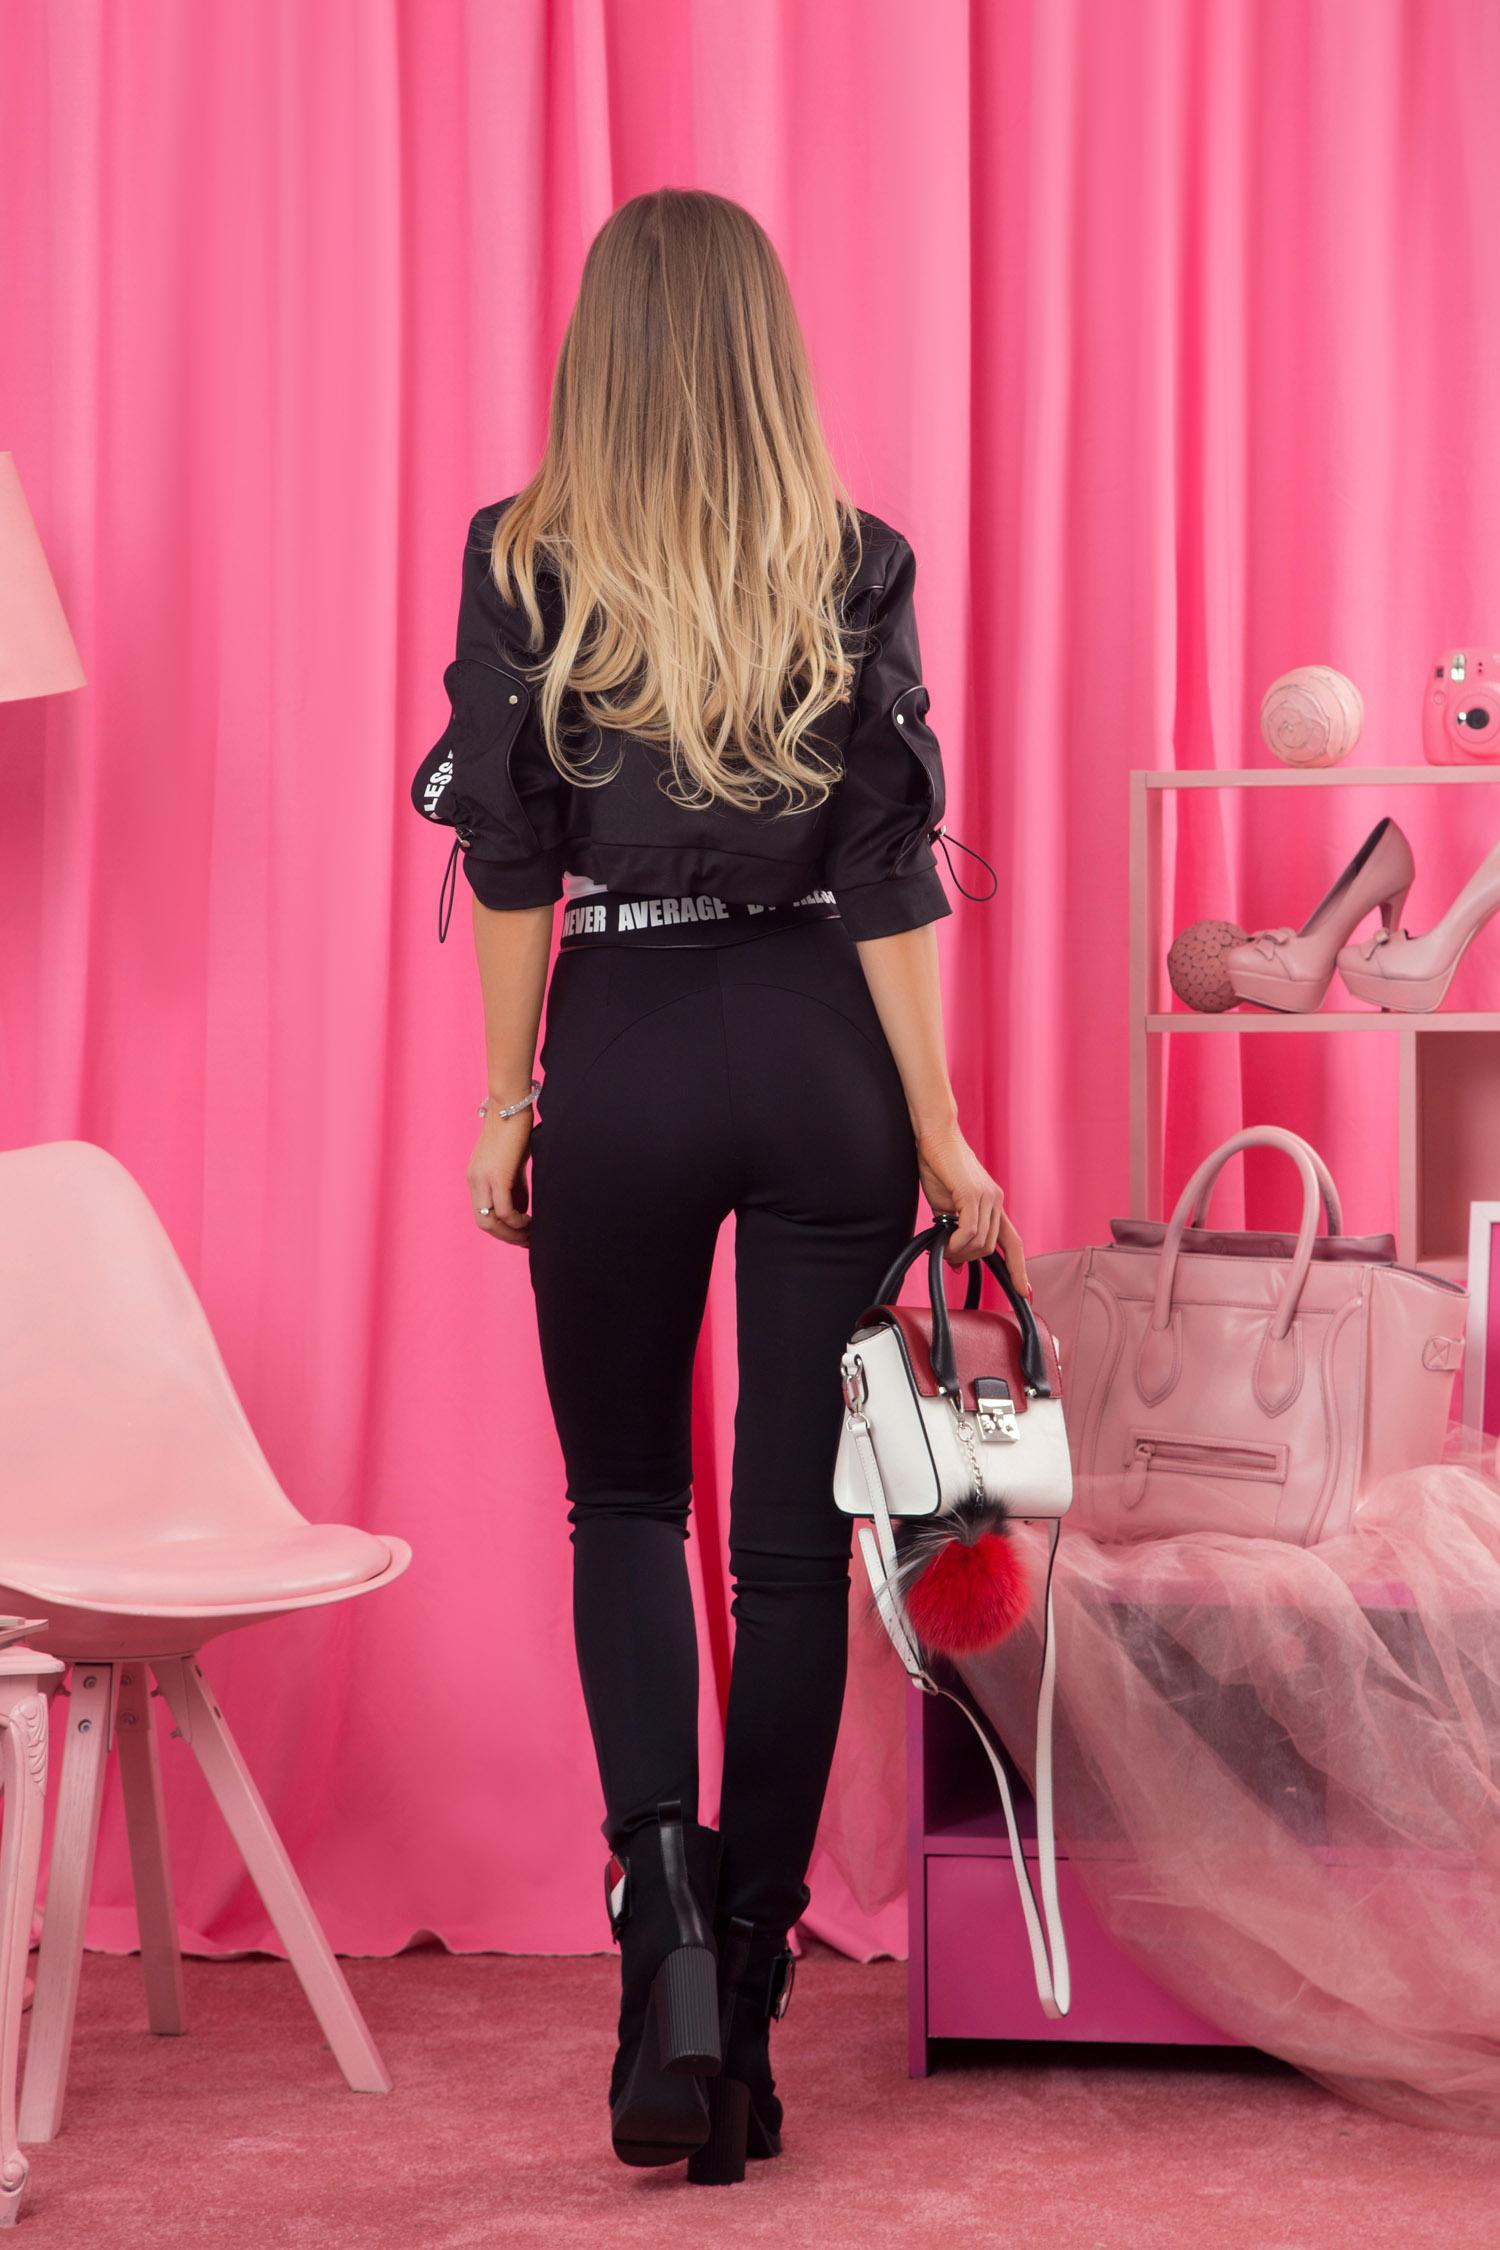 Never average by Alessa панталон - черно